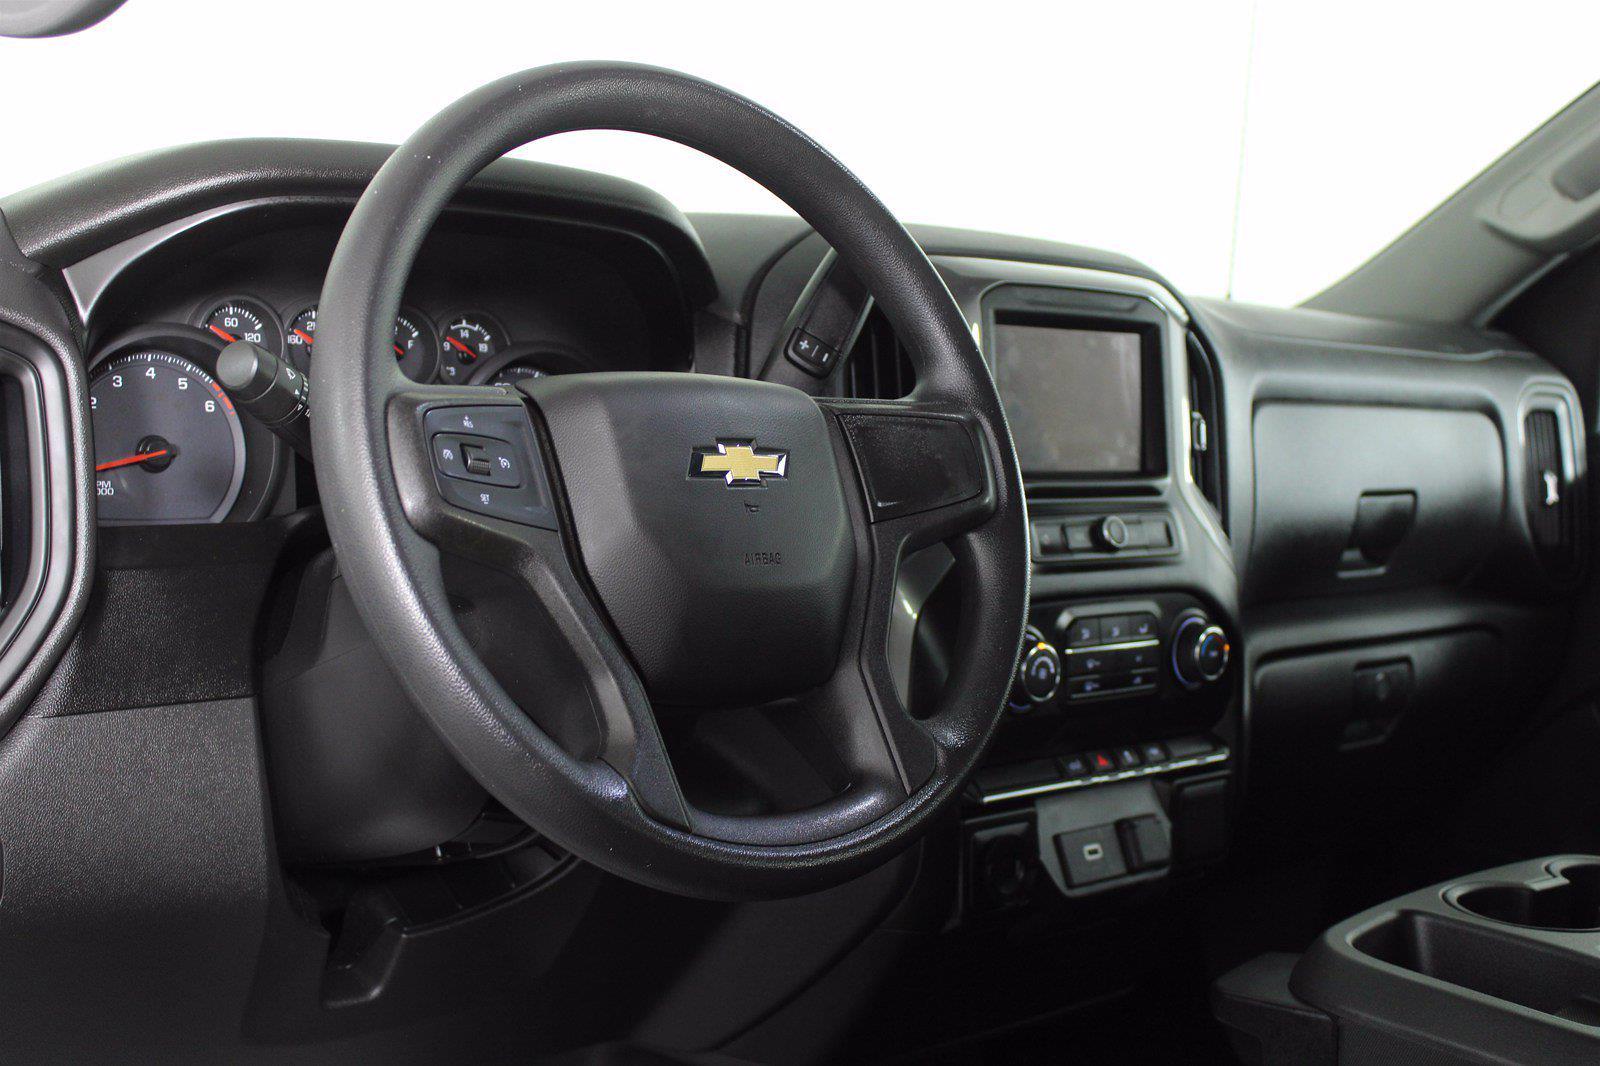 2020 Chevrolet Silverado 1500 Crew Cab 4x2, Pickup #DTC1616 - photo 5